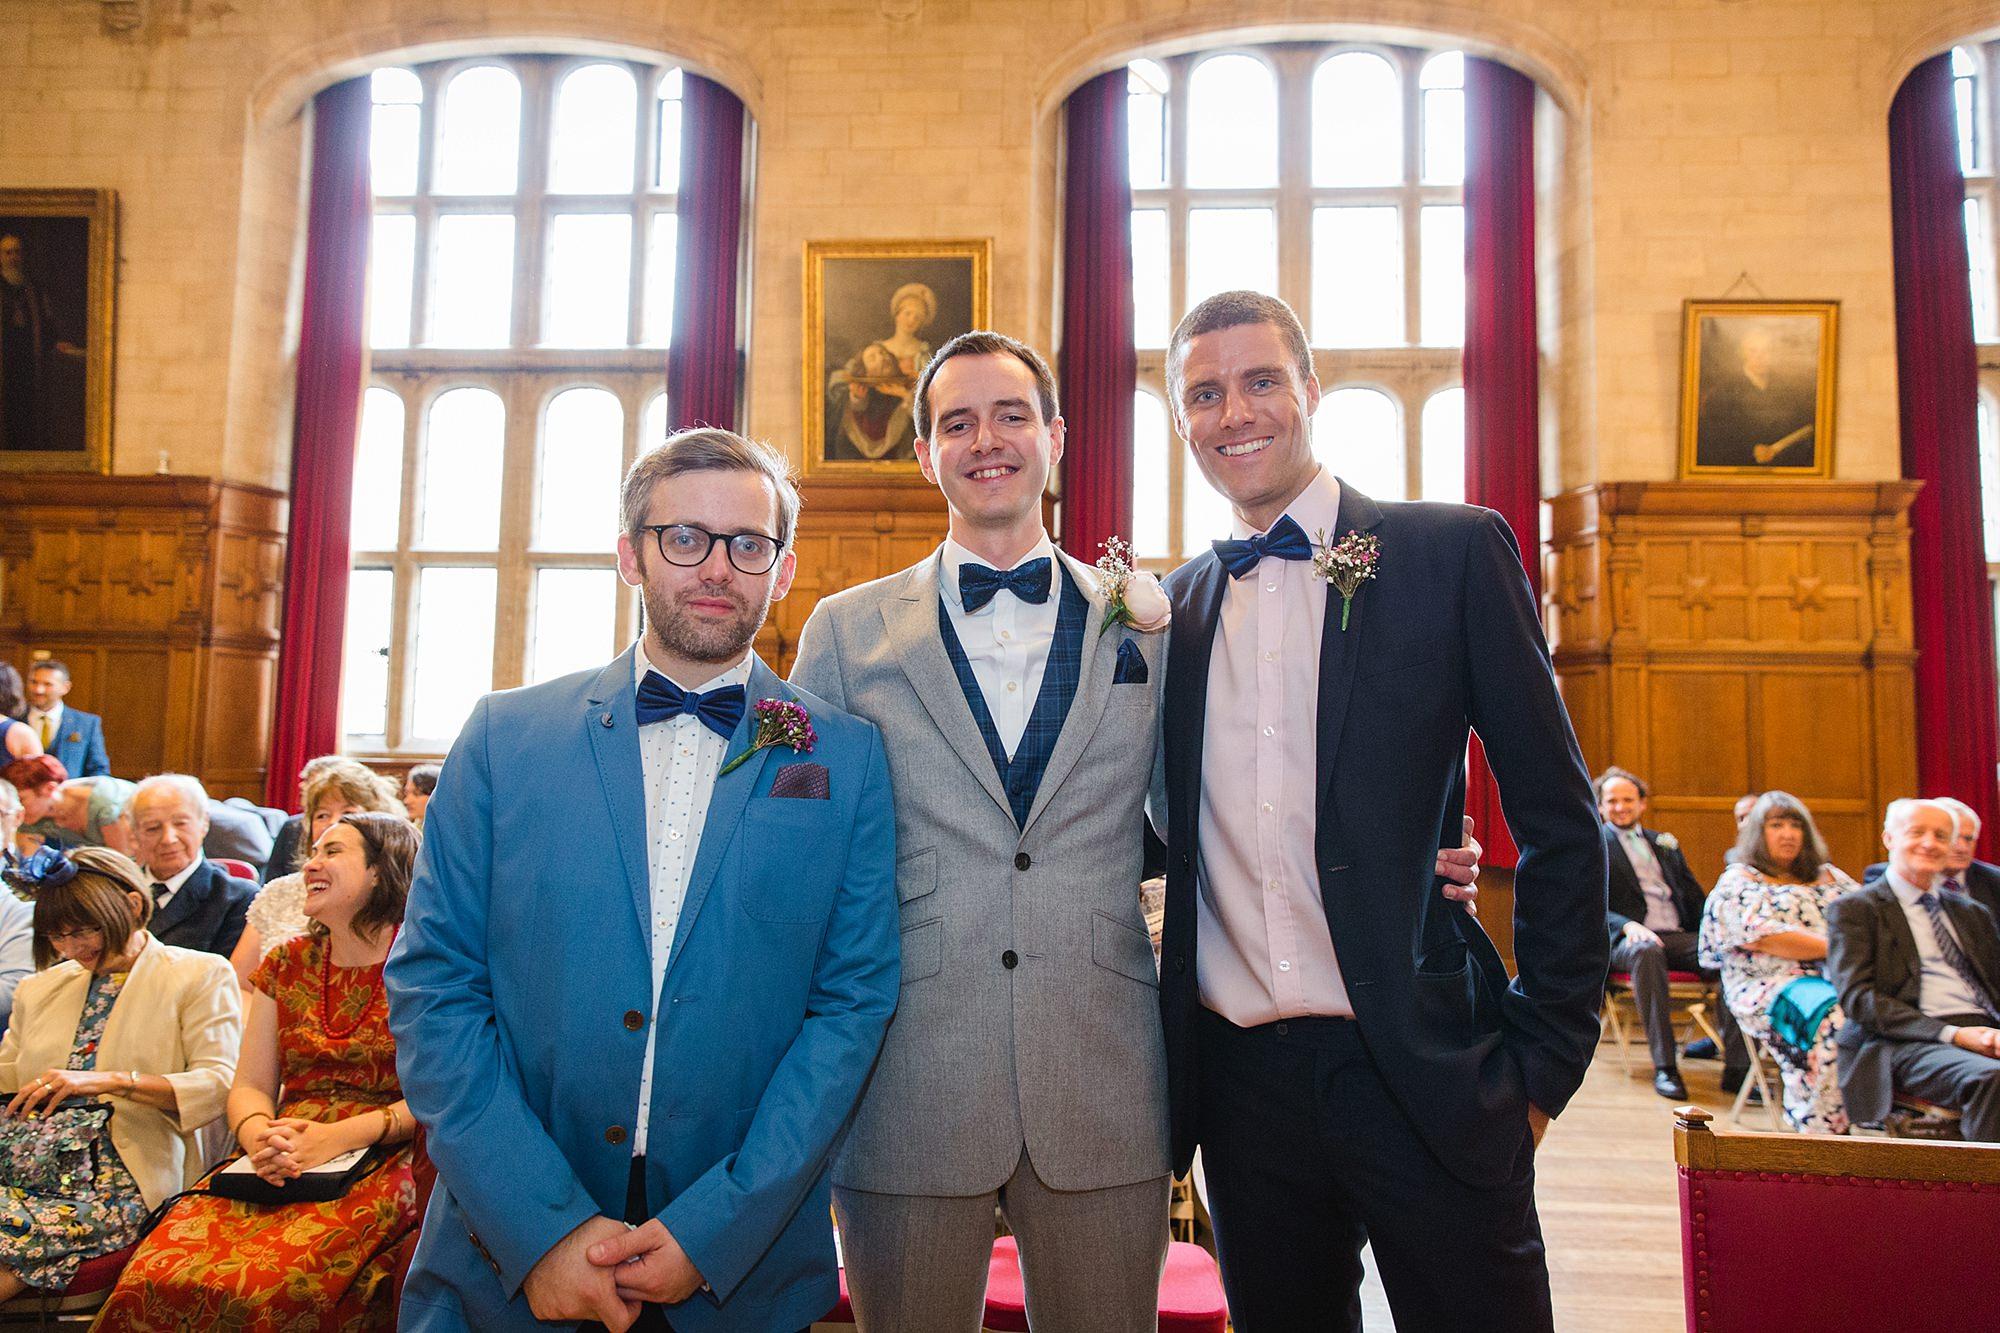 Isis Farmhouse Oxford Wedding portrait of groom and groomsmen ahead of wedding